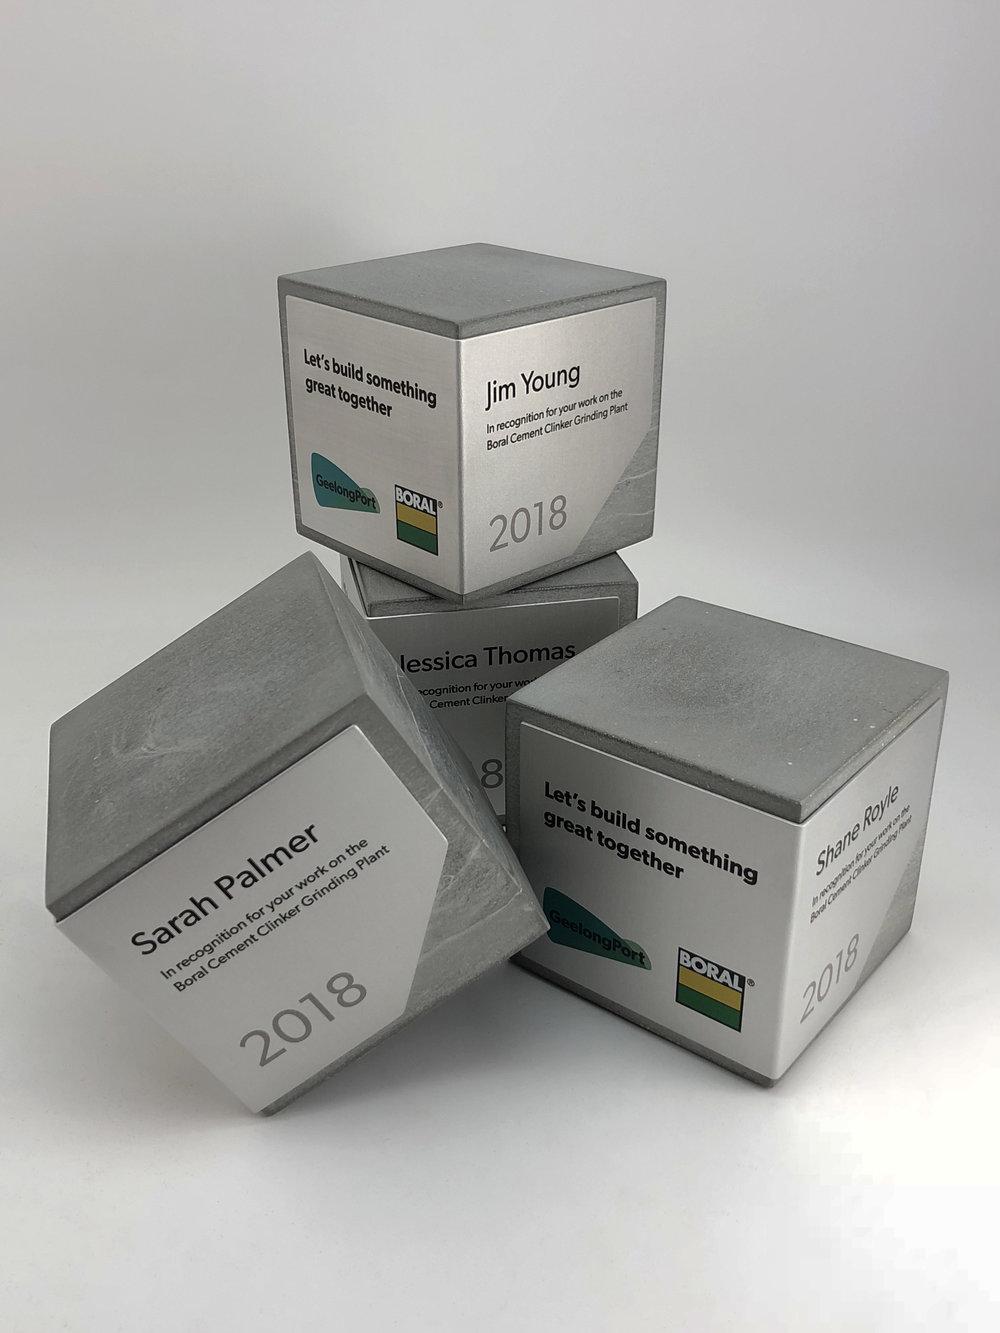 geelong-port-cement-cube-awards-trophy-03 copy.jpg